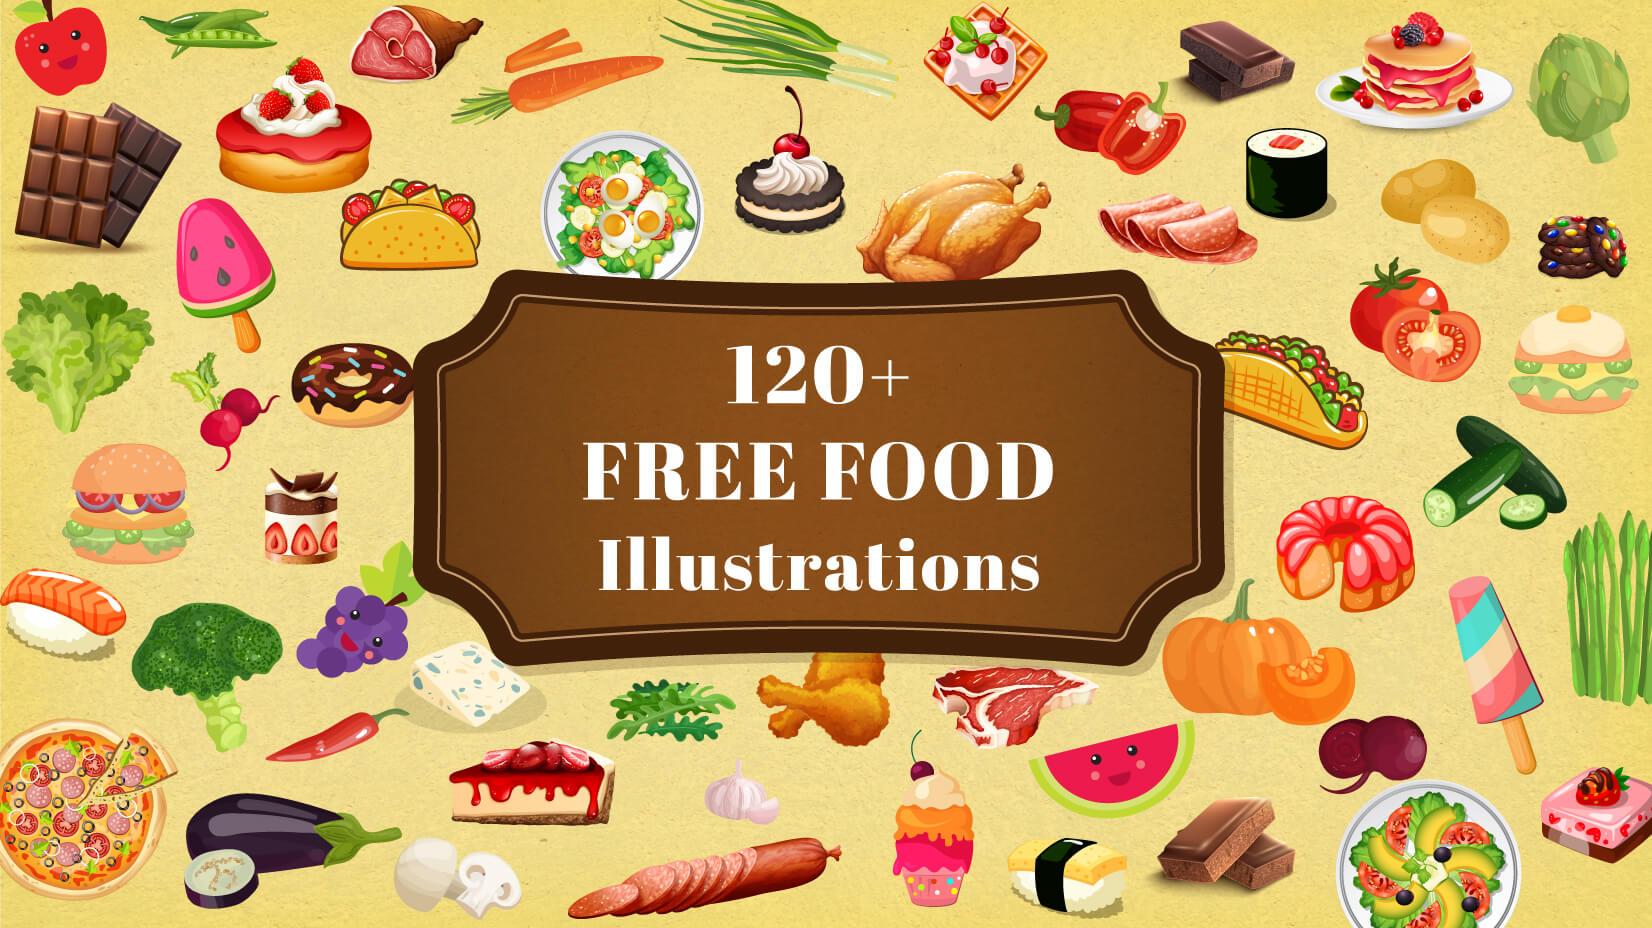 Best 120+ Free Food Illustrations